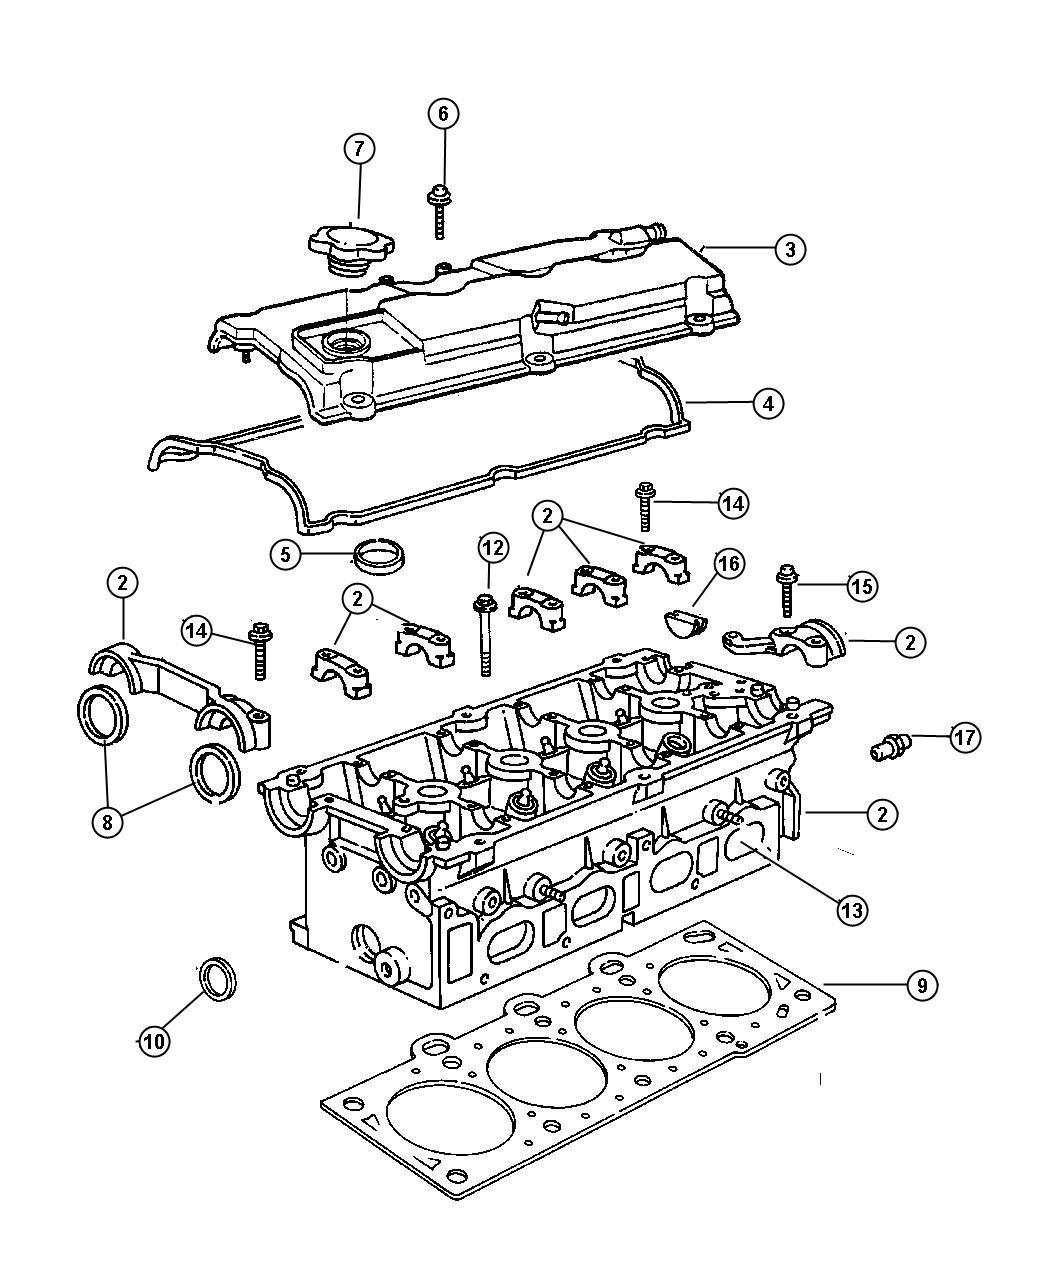 2006 pt cruiser engine diagram massey ferguson 35 wiring chrysler gasket cylinder head left